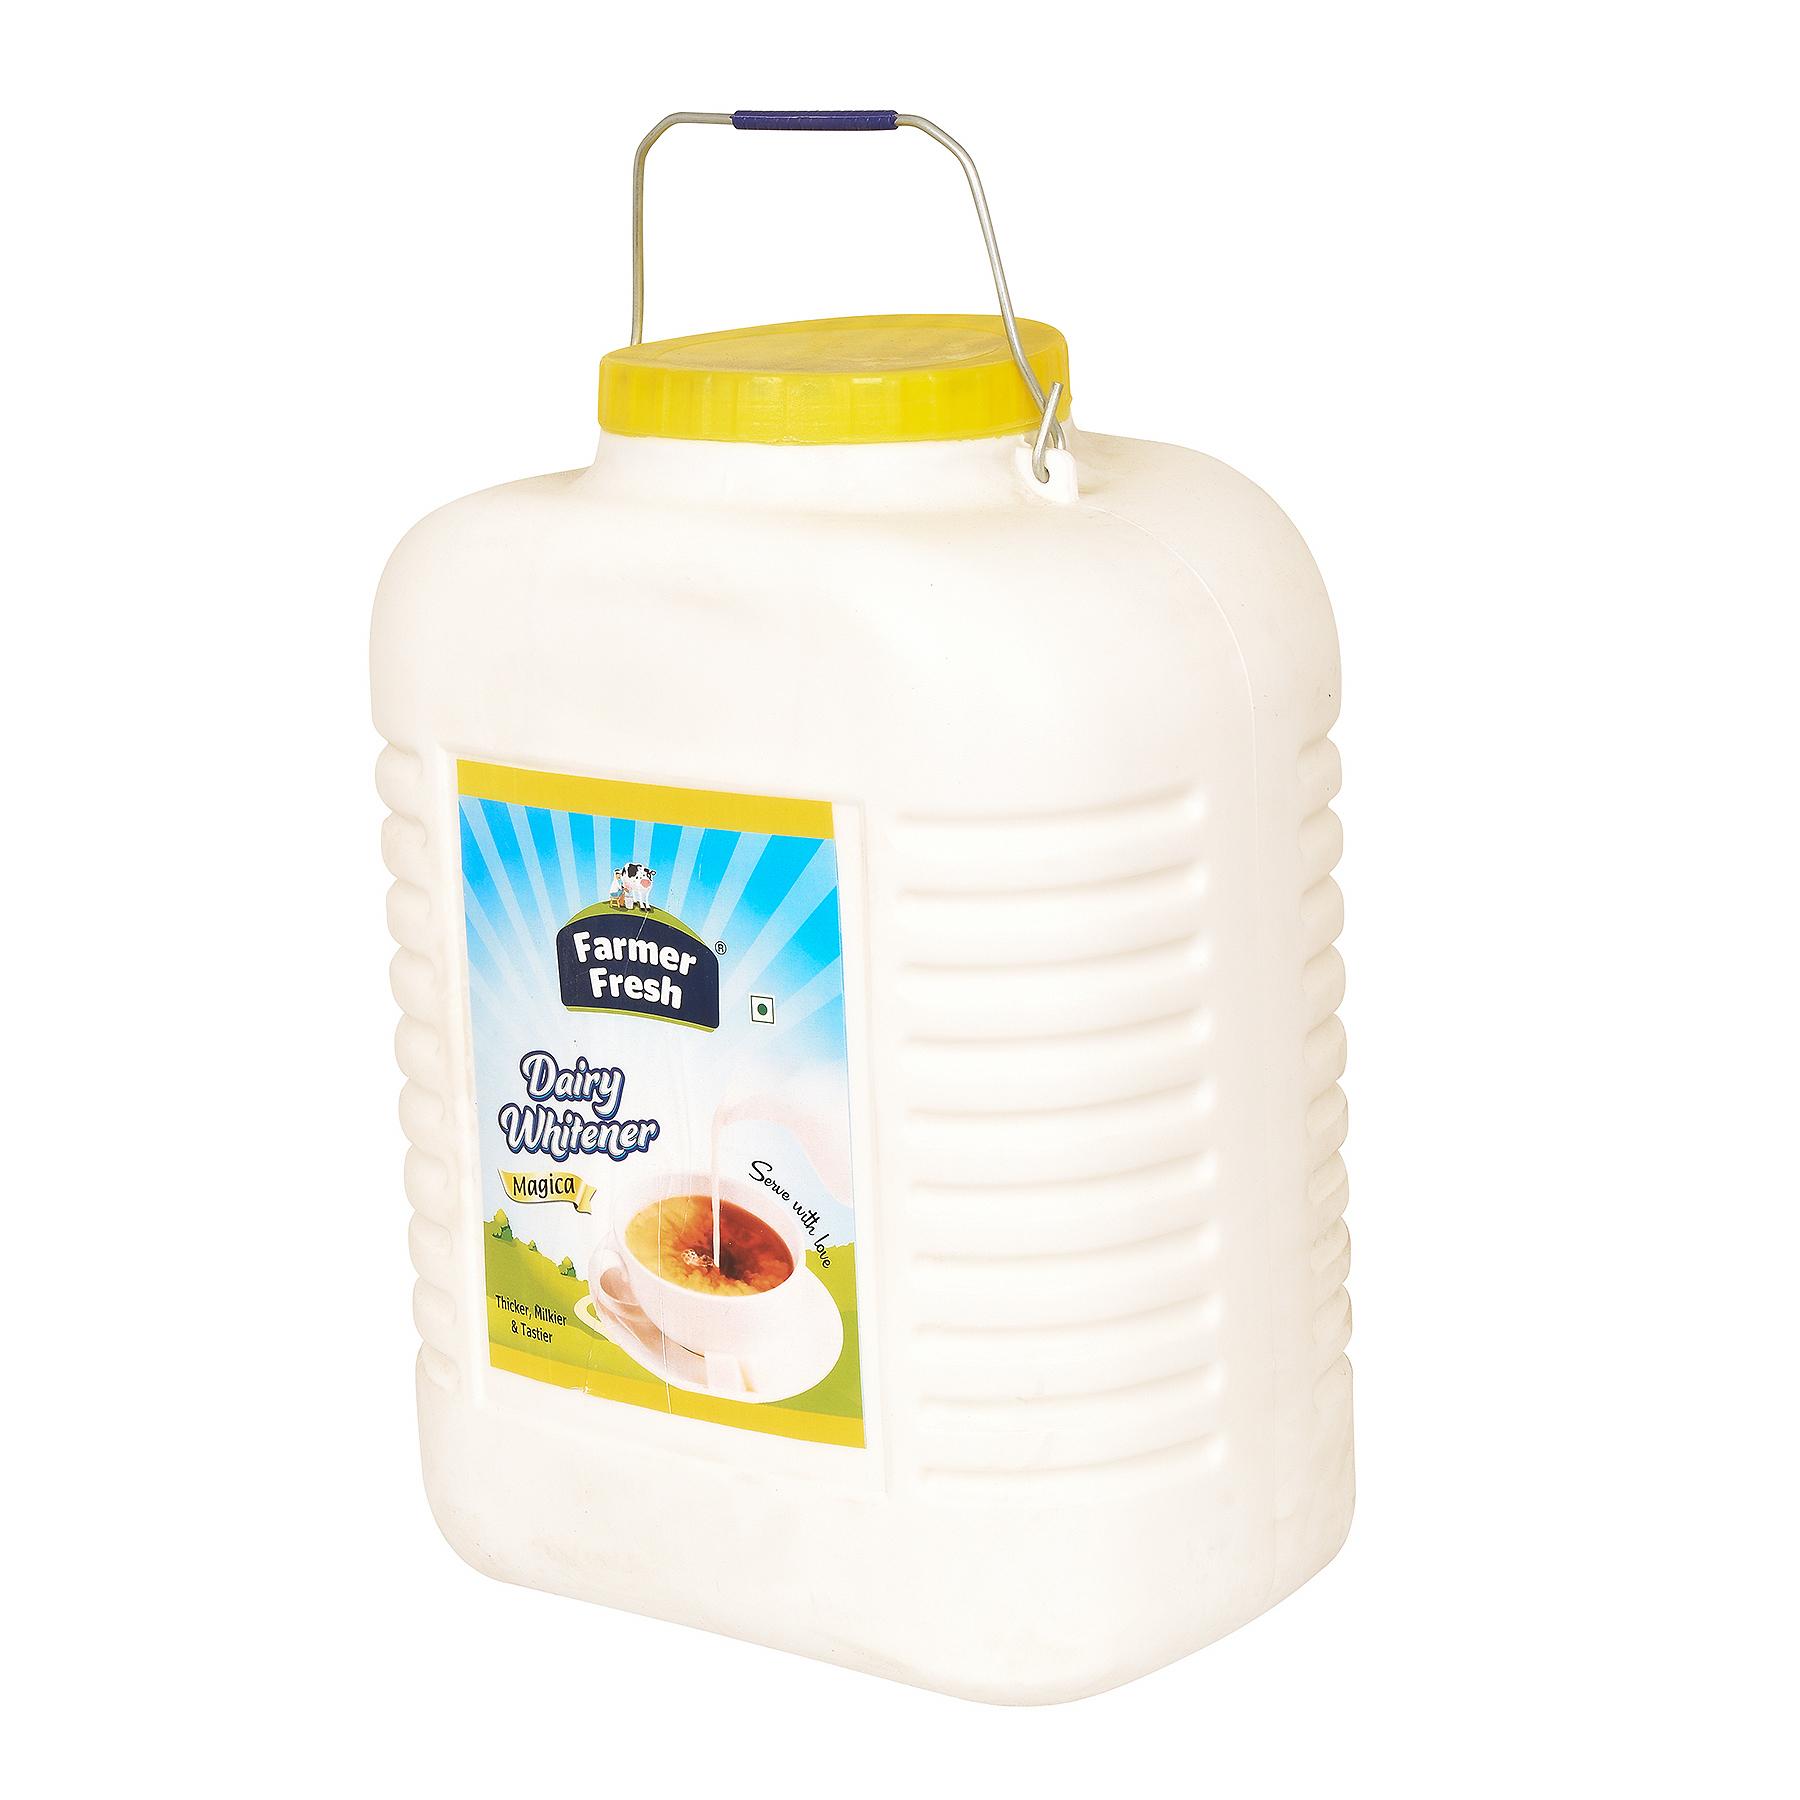 Farmer Fresh Dairy Whitener Magica 10kg